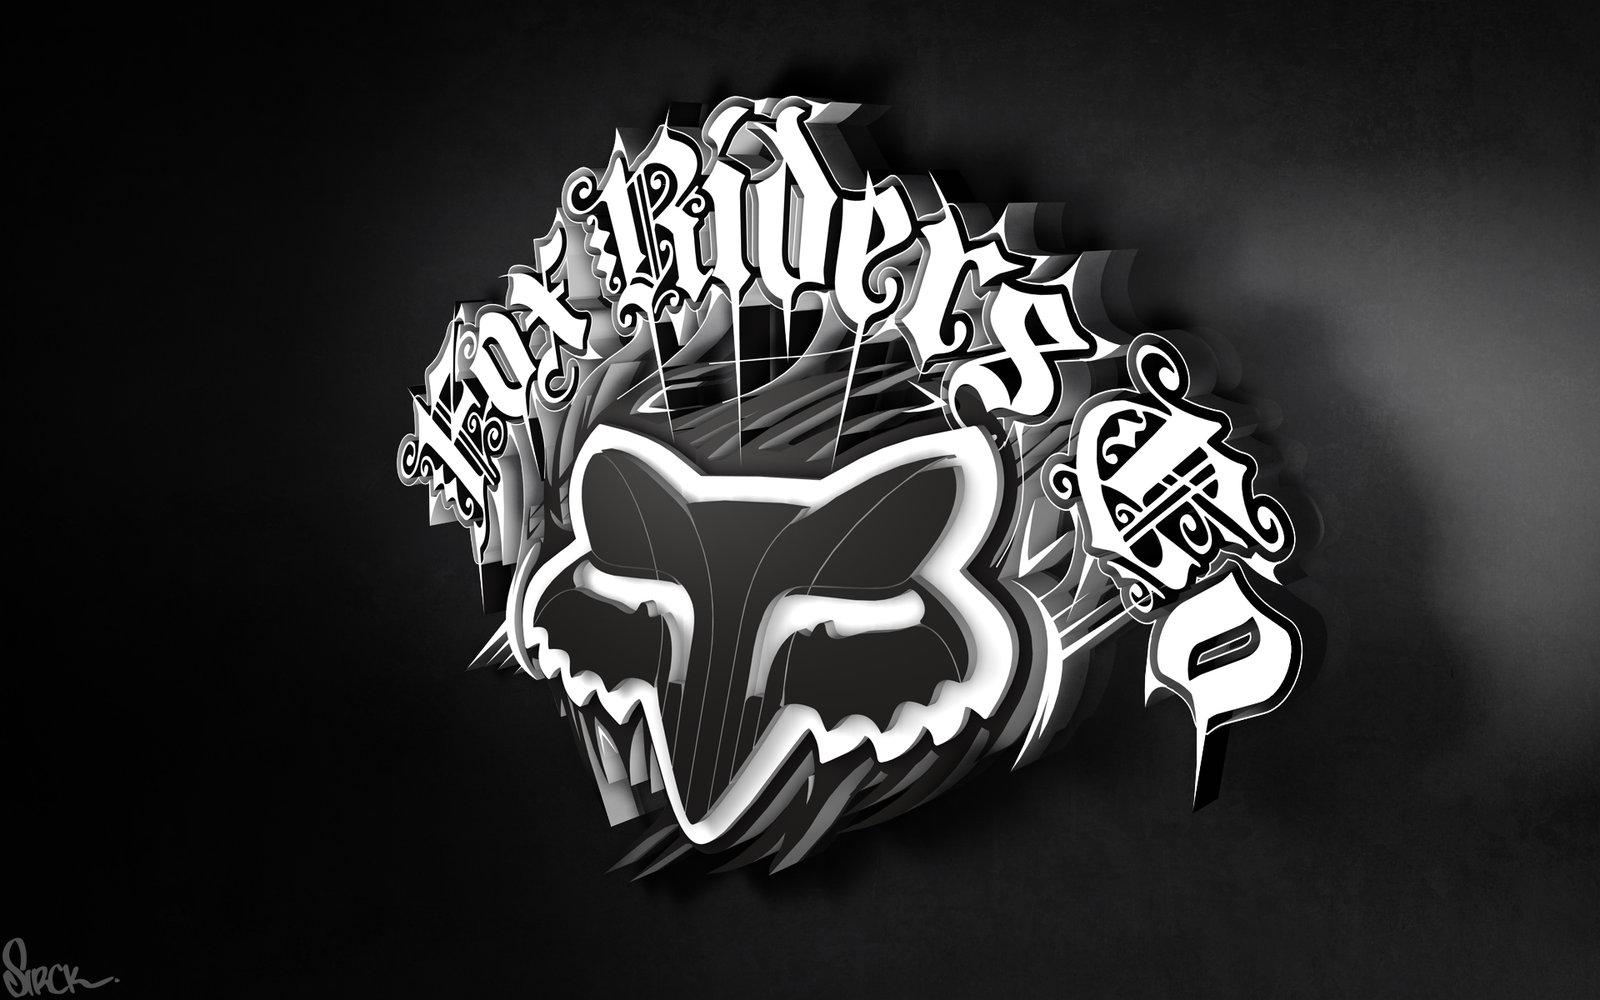 fox riders 3d logo wallpaper by small sk8er customization wallpaper 1600x1000